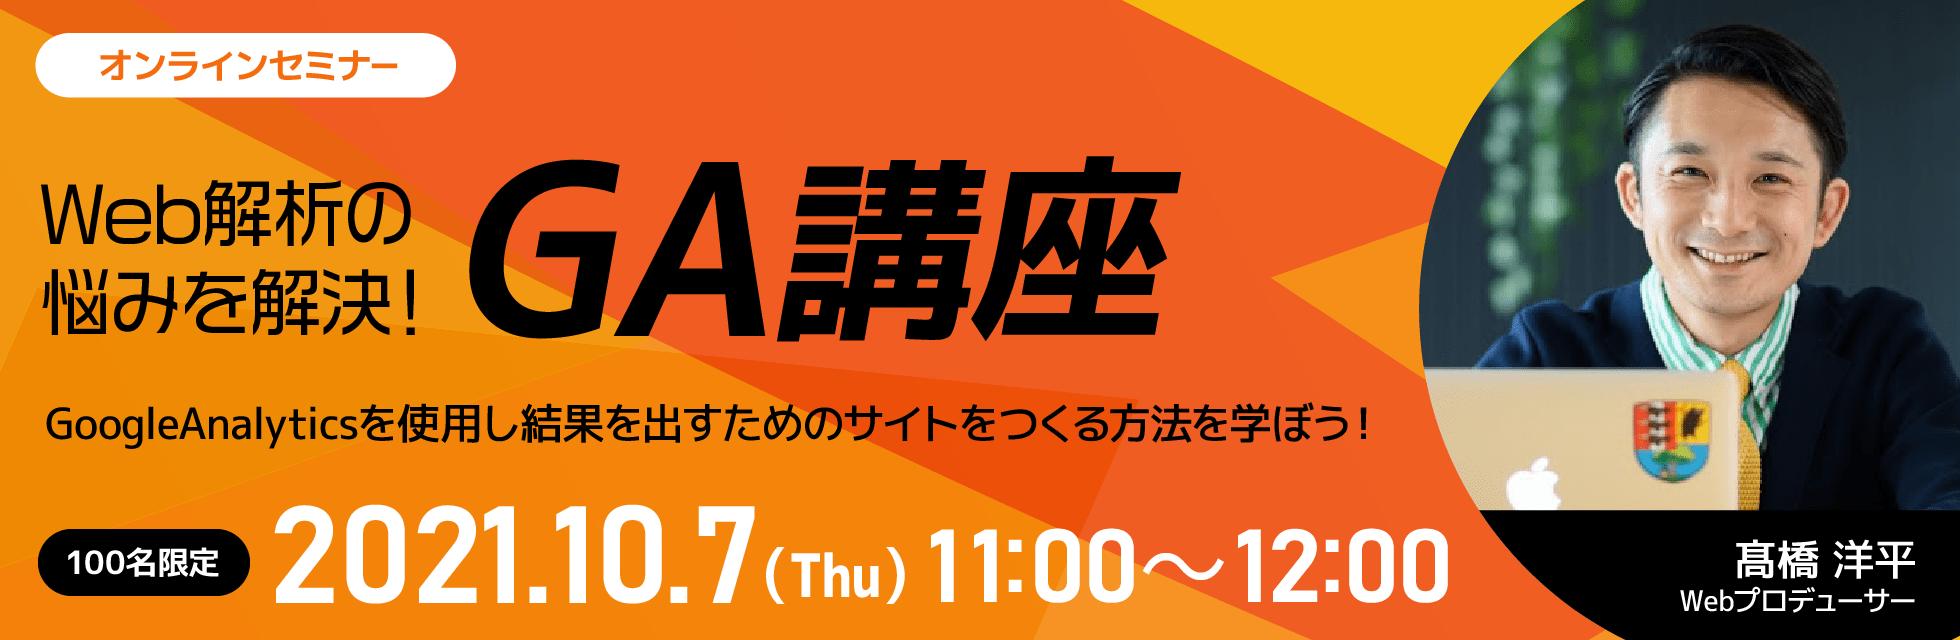 Web解析の悩みを解決!GA講座★10月7日(木)開催!